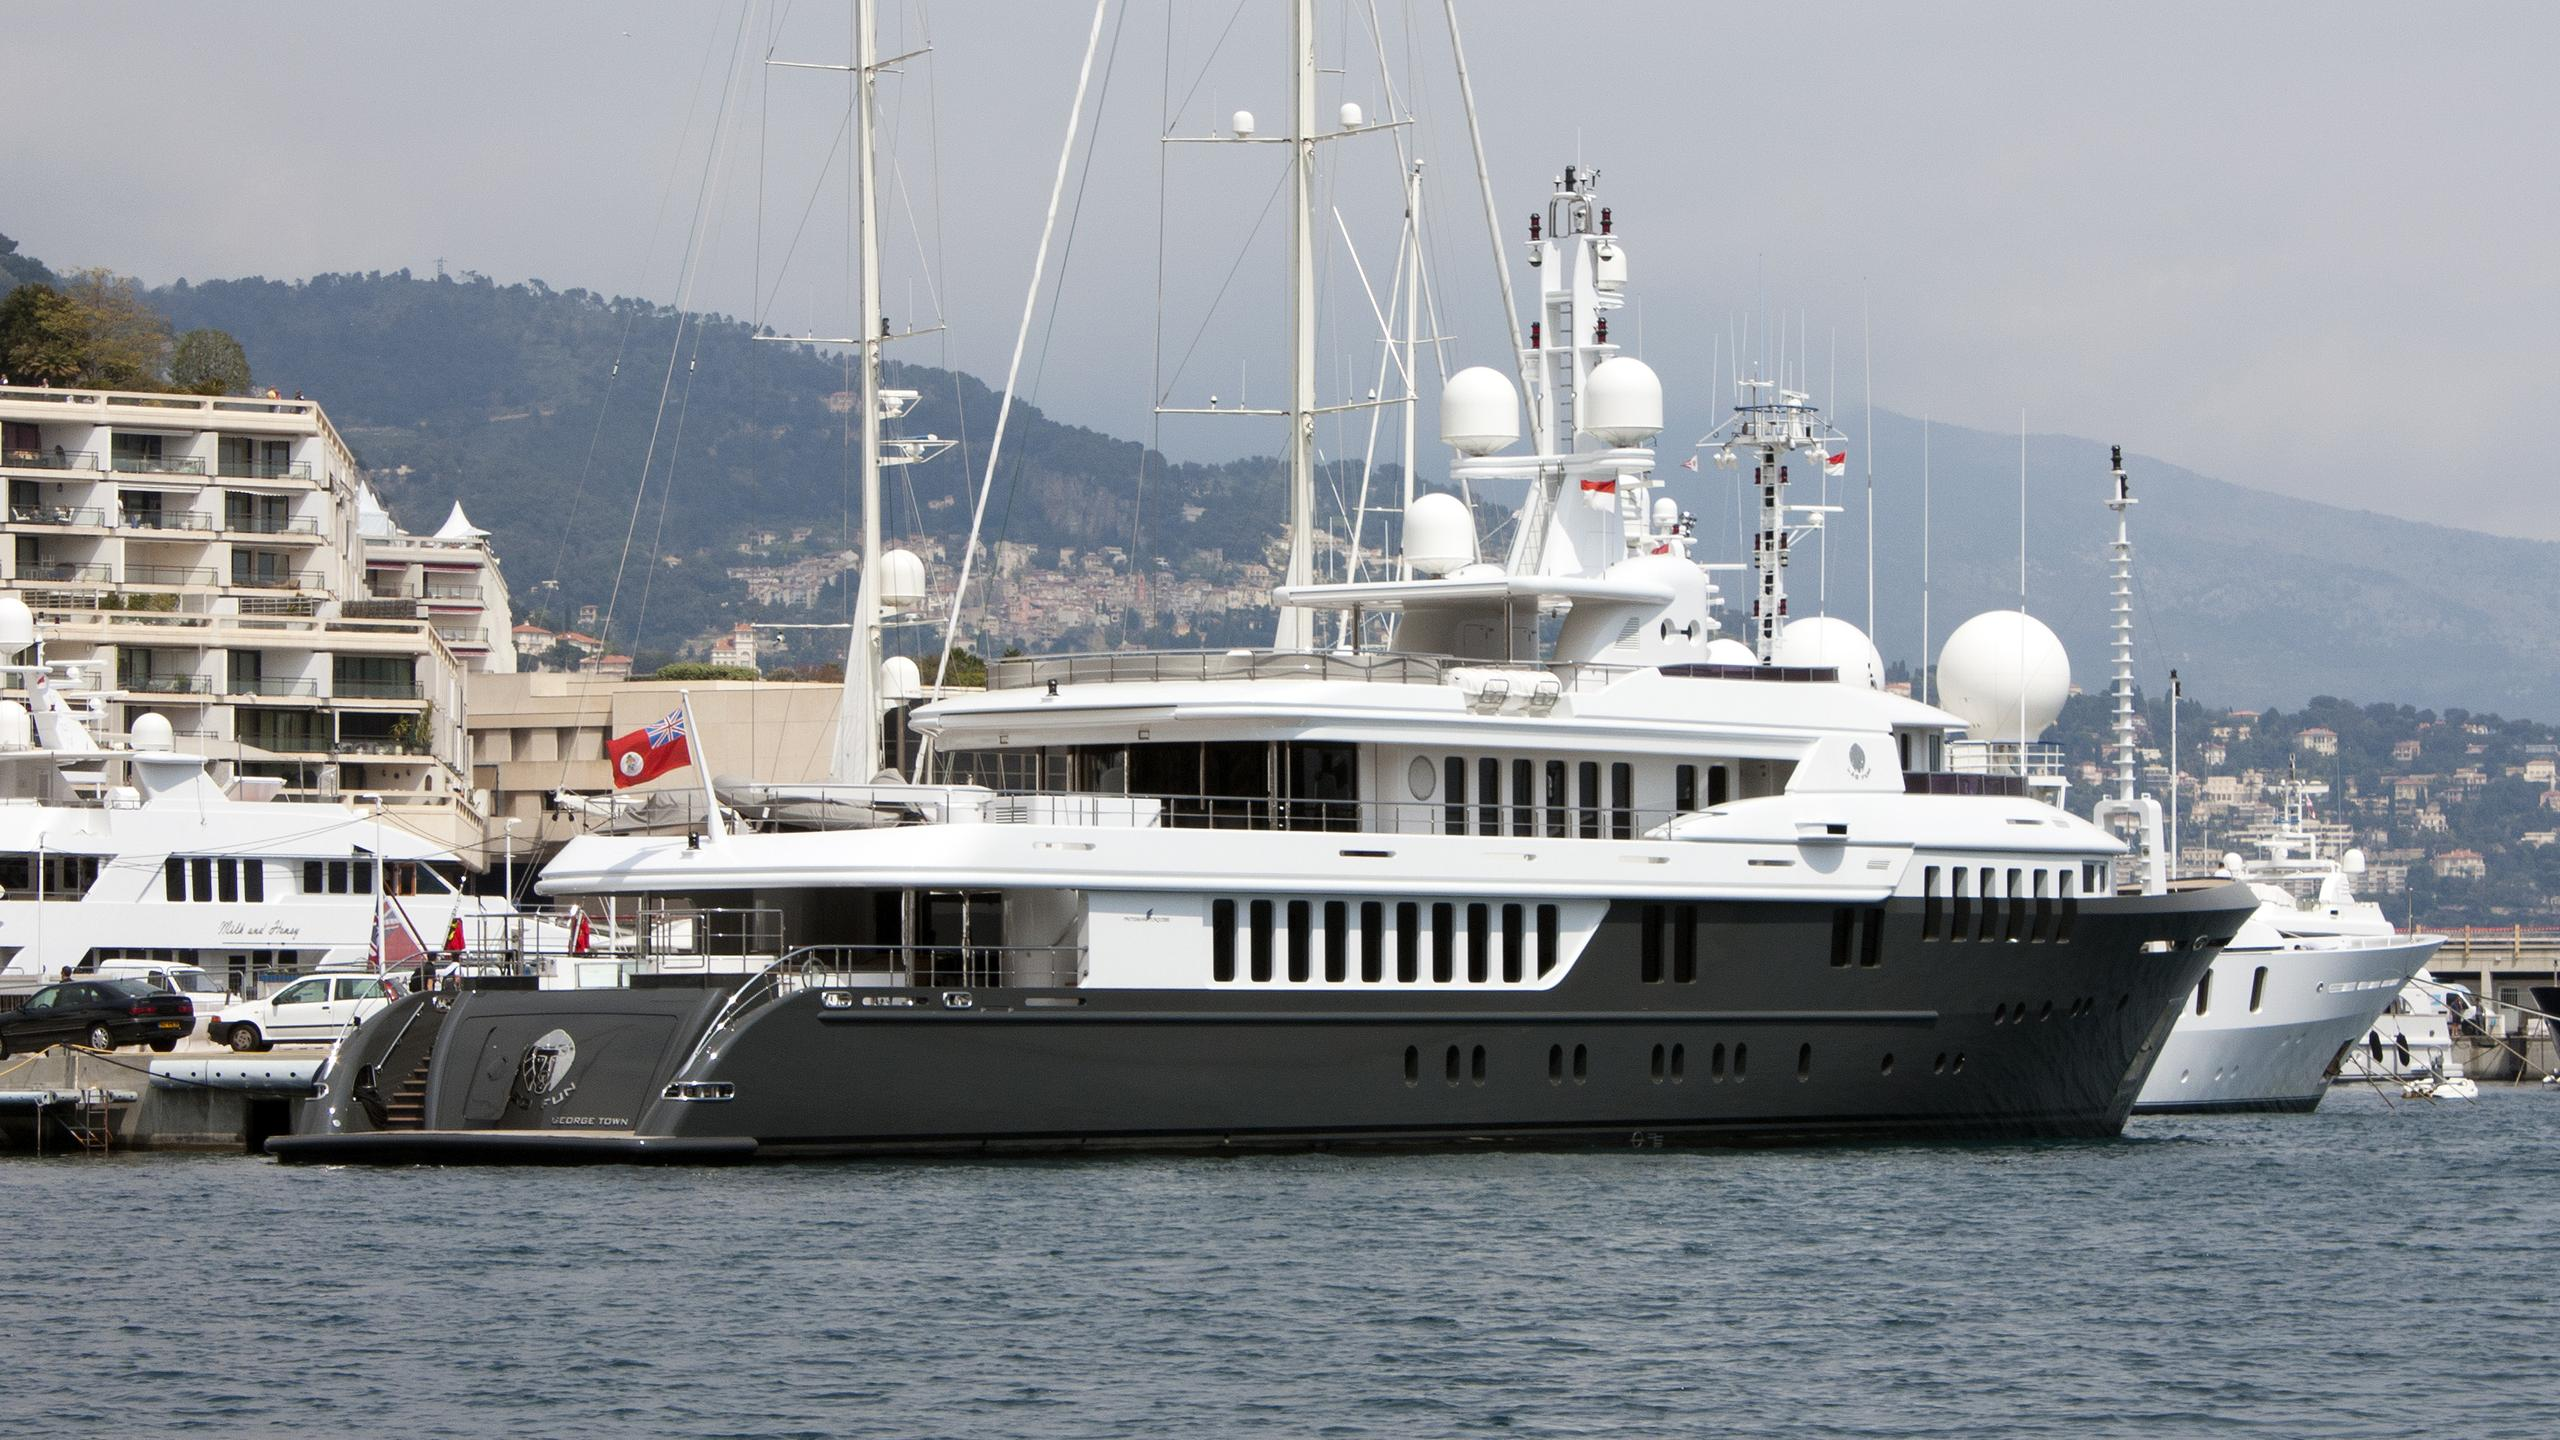 chayka-explorer-yacht-turquoise-yachts-2009-54m-profile